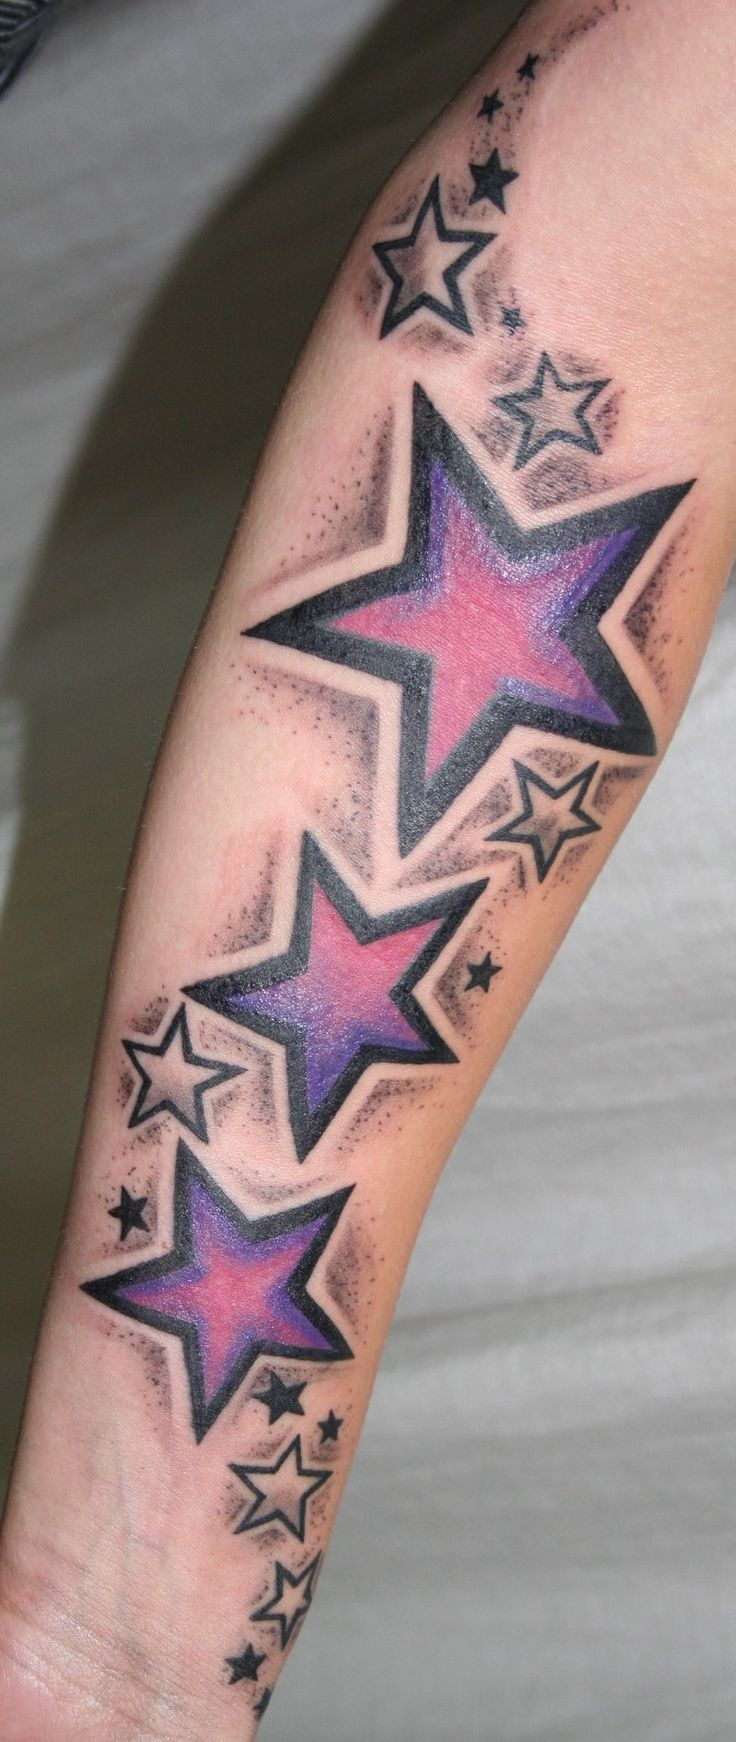 это картинки тату из звезд на руке уточняйте консультанта при